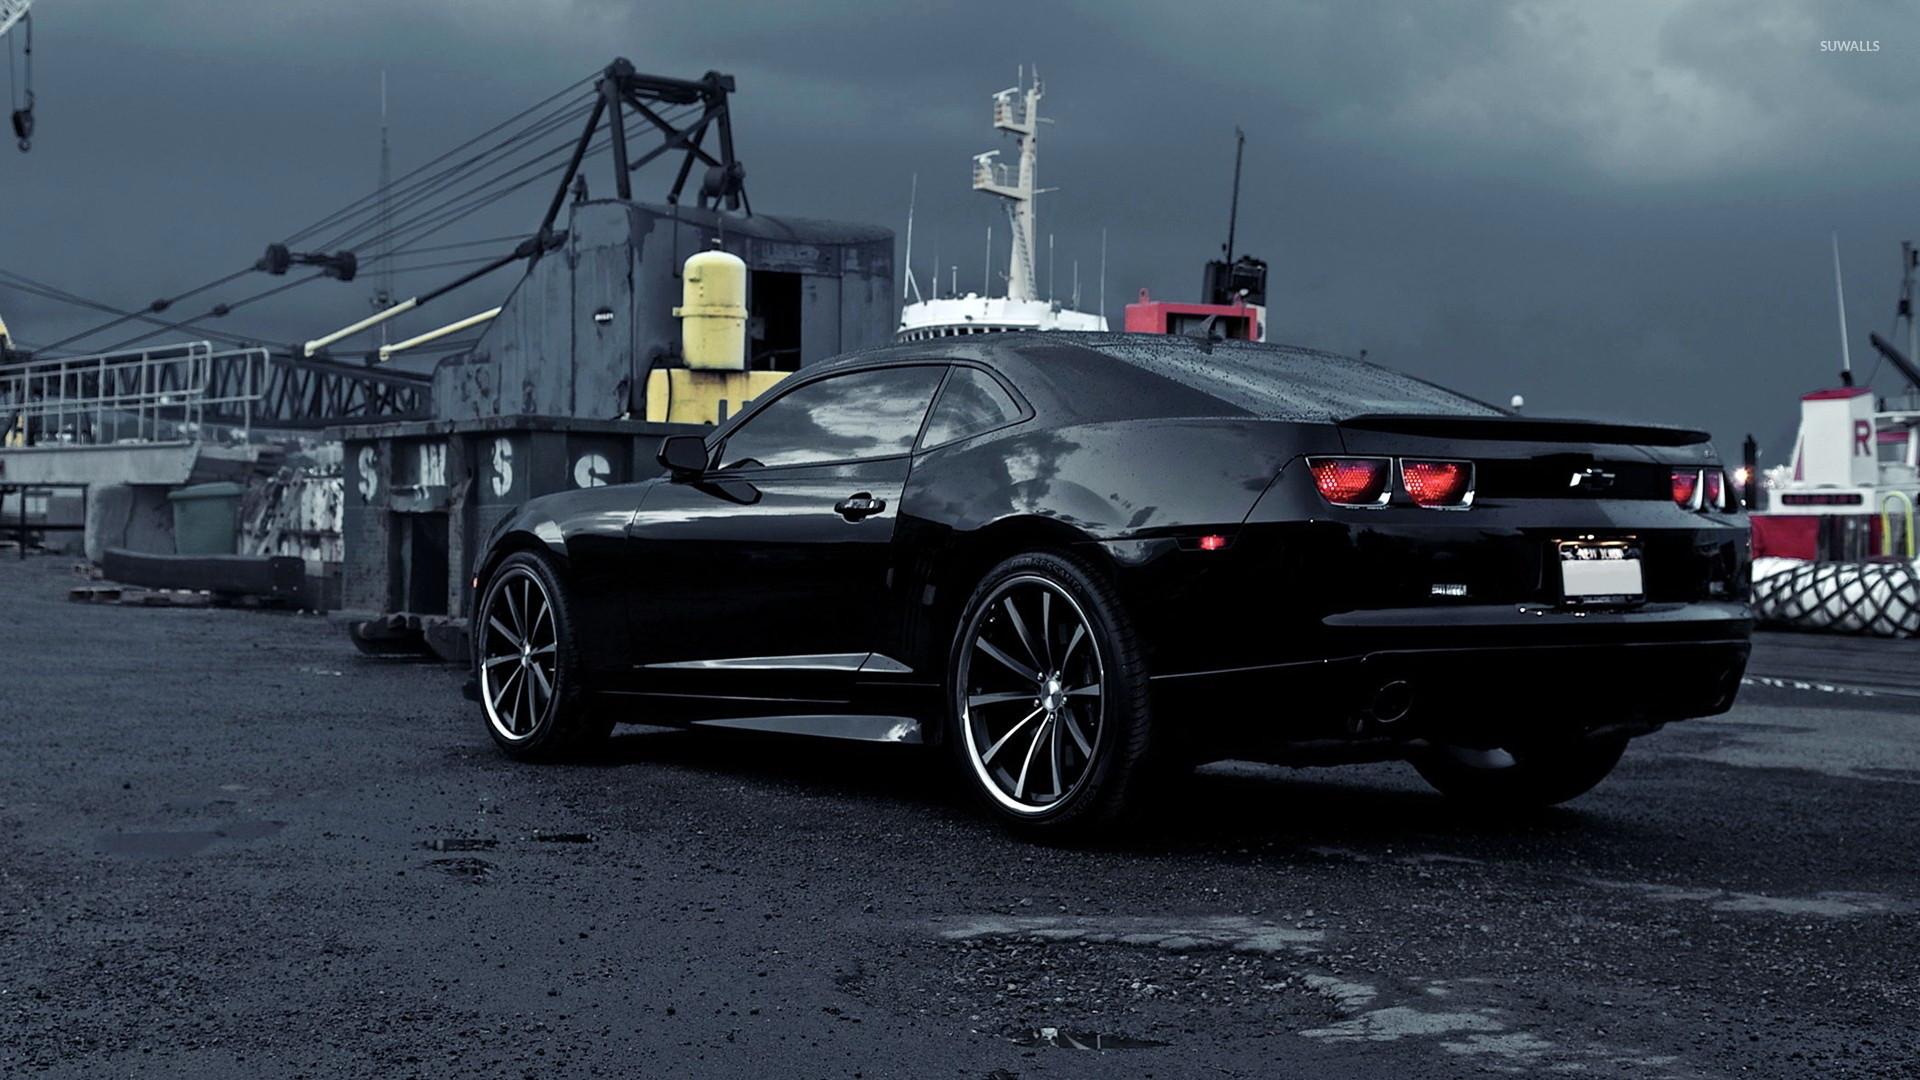 Black Chevrolet Camaro on a rainy day wallpaper